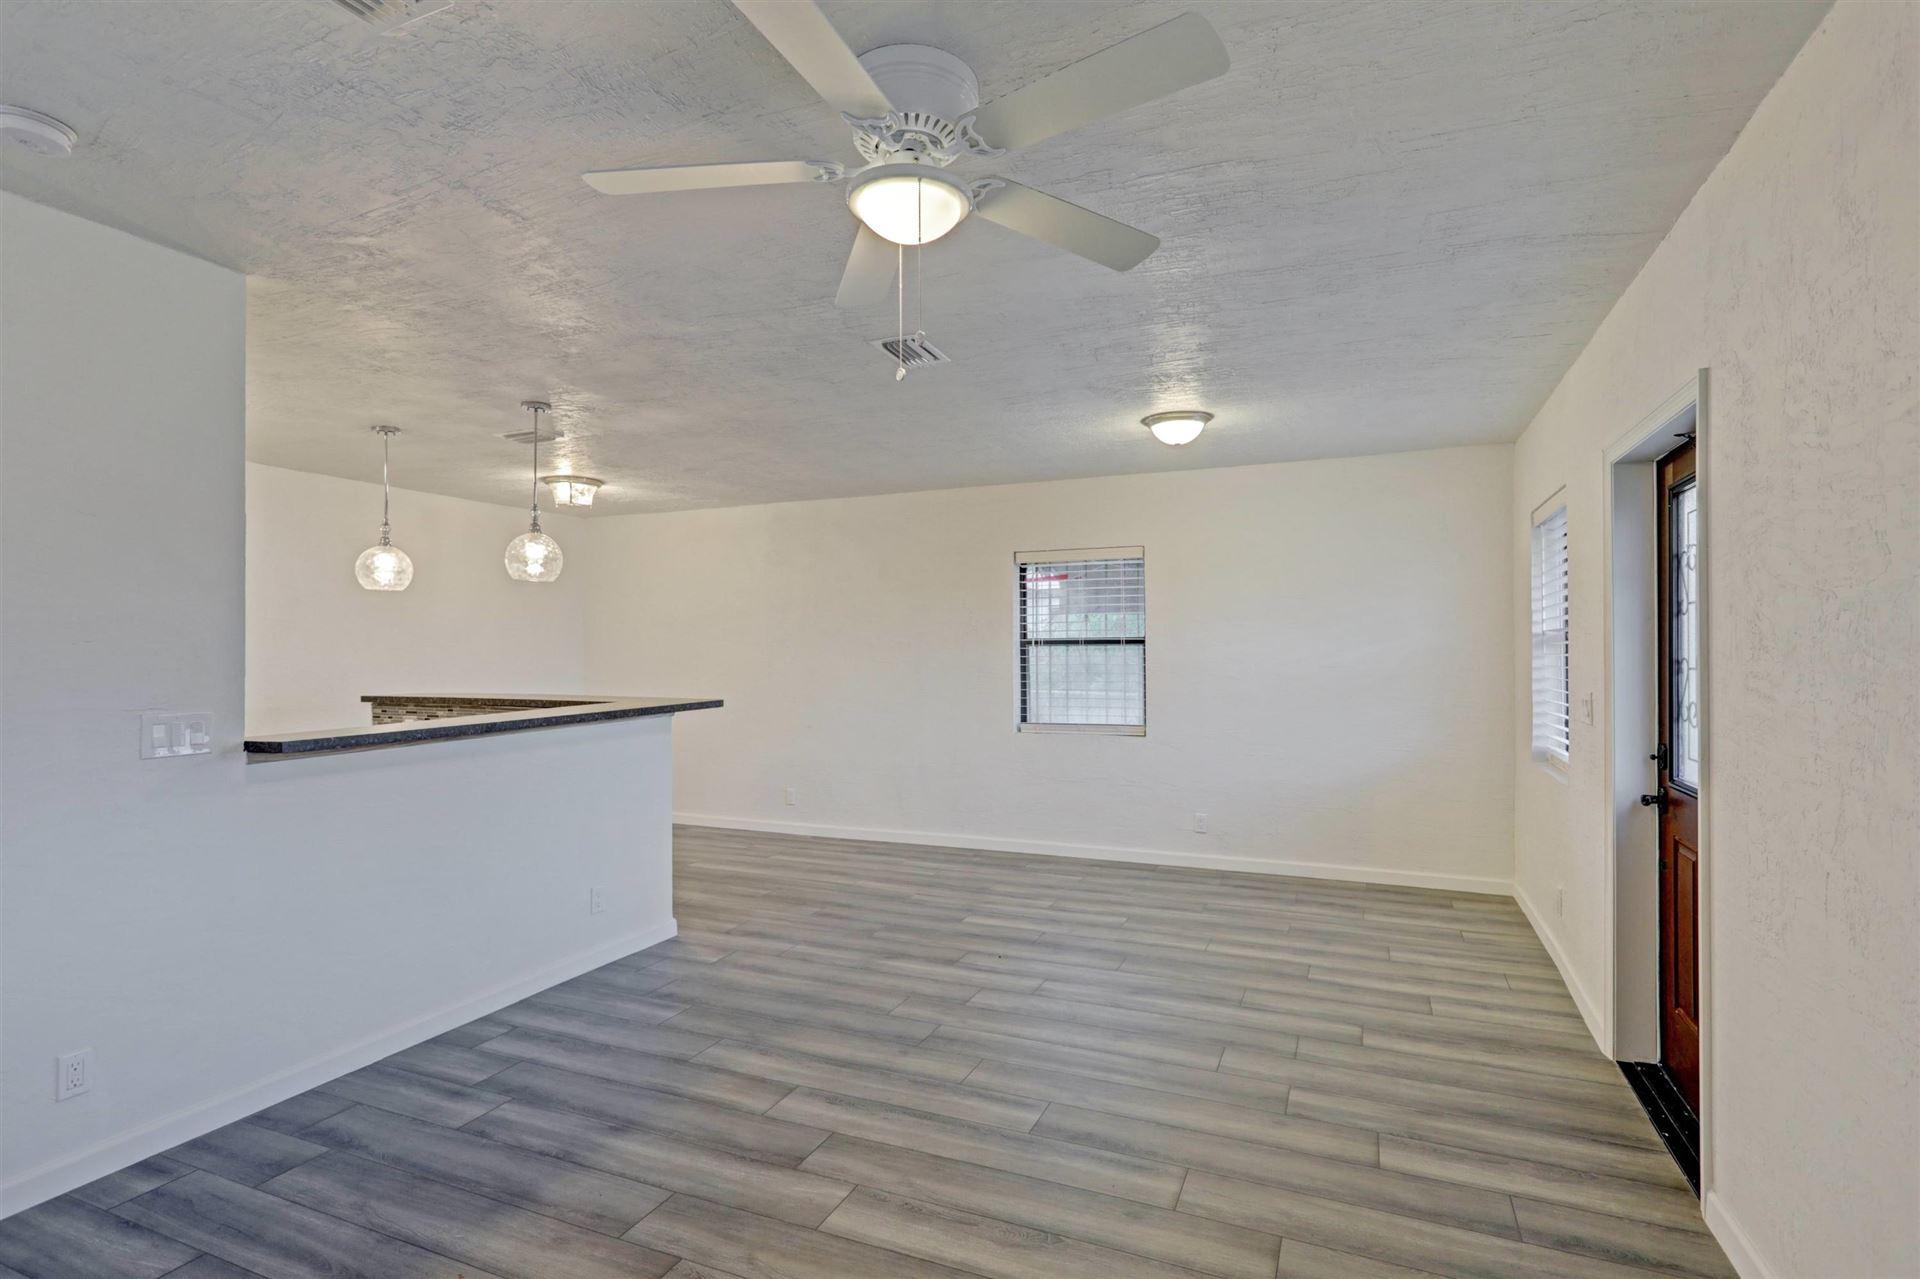 Photo of 1601 F Avenue, Riviera Beach, FL 33404 (MLS # RX-10729185)